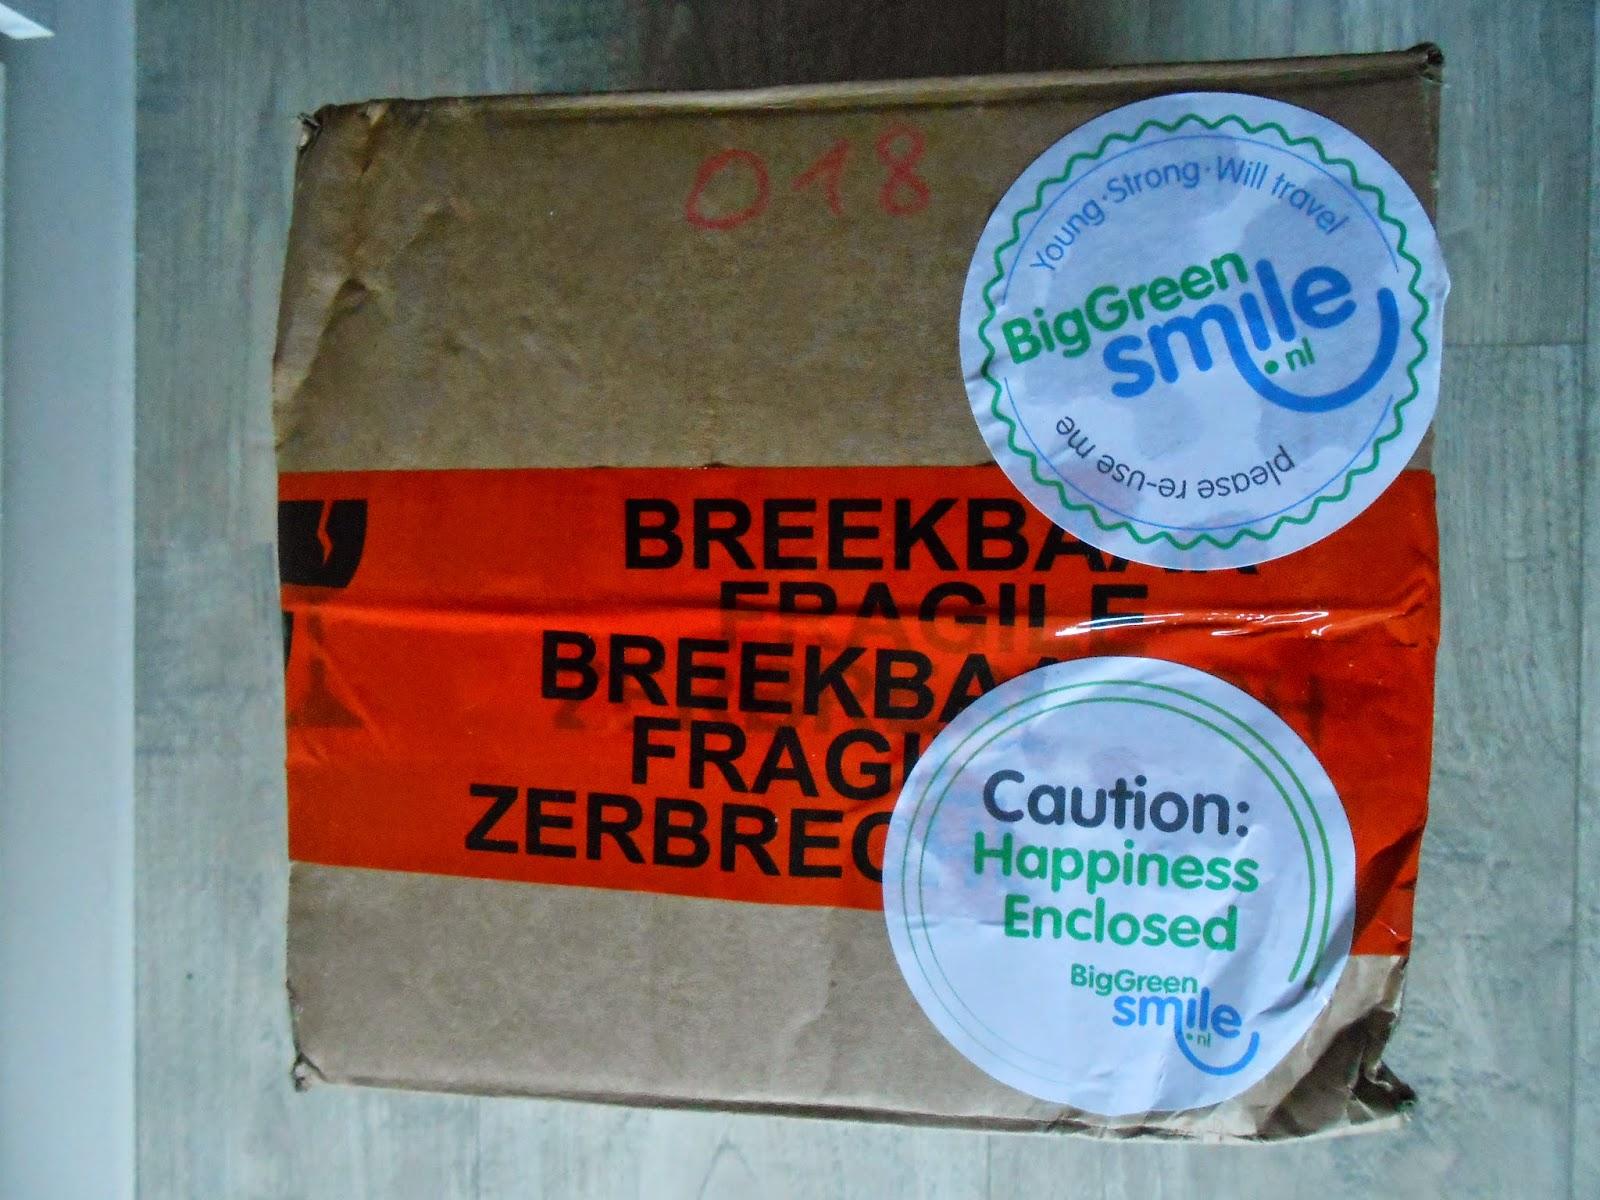 New beautystuff | Green Big Smile.nl